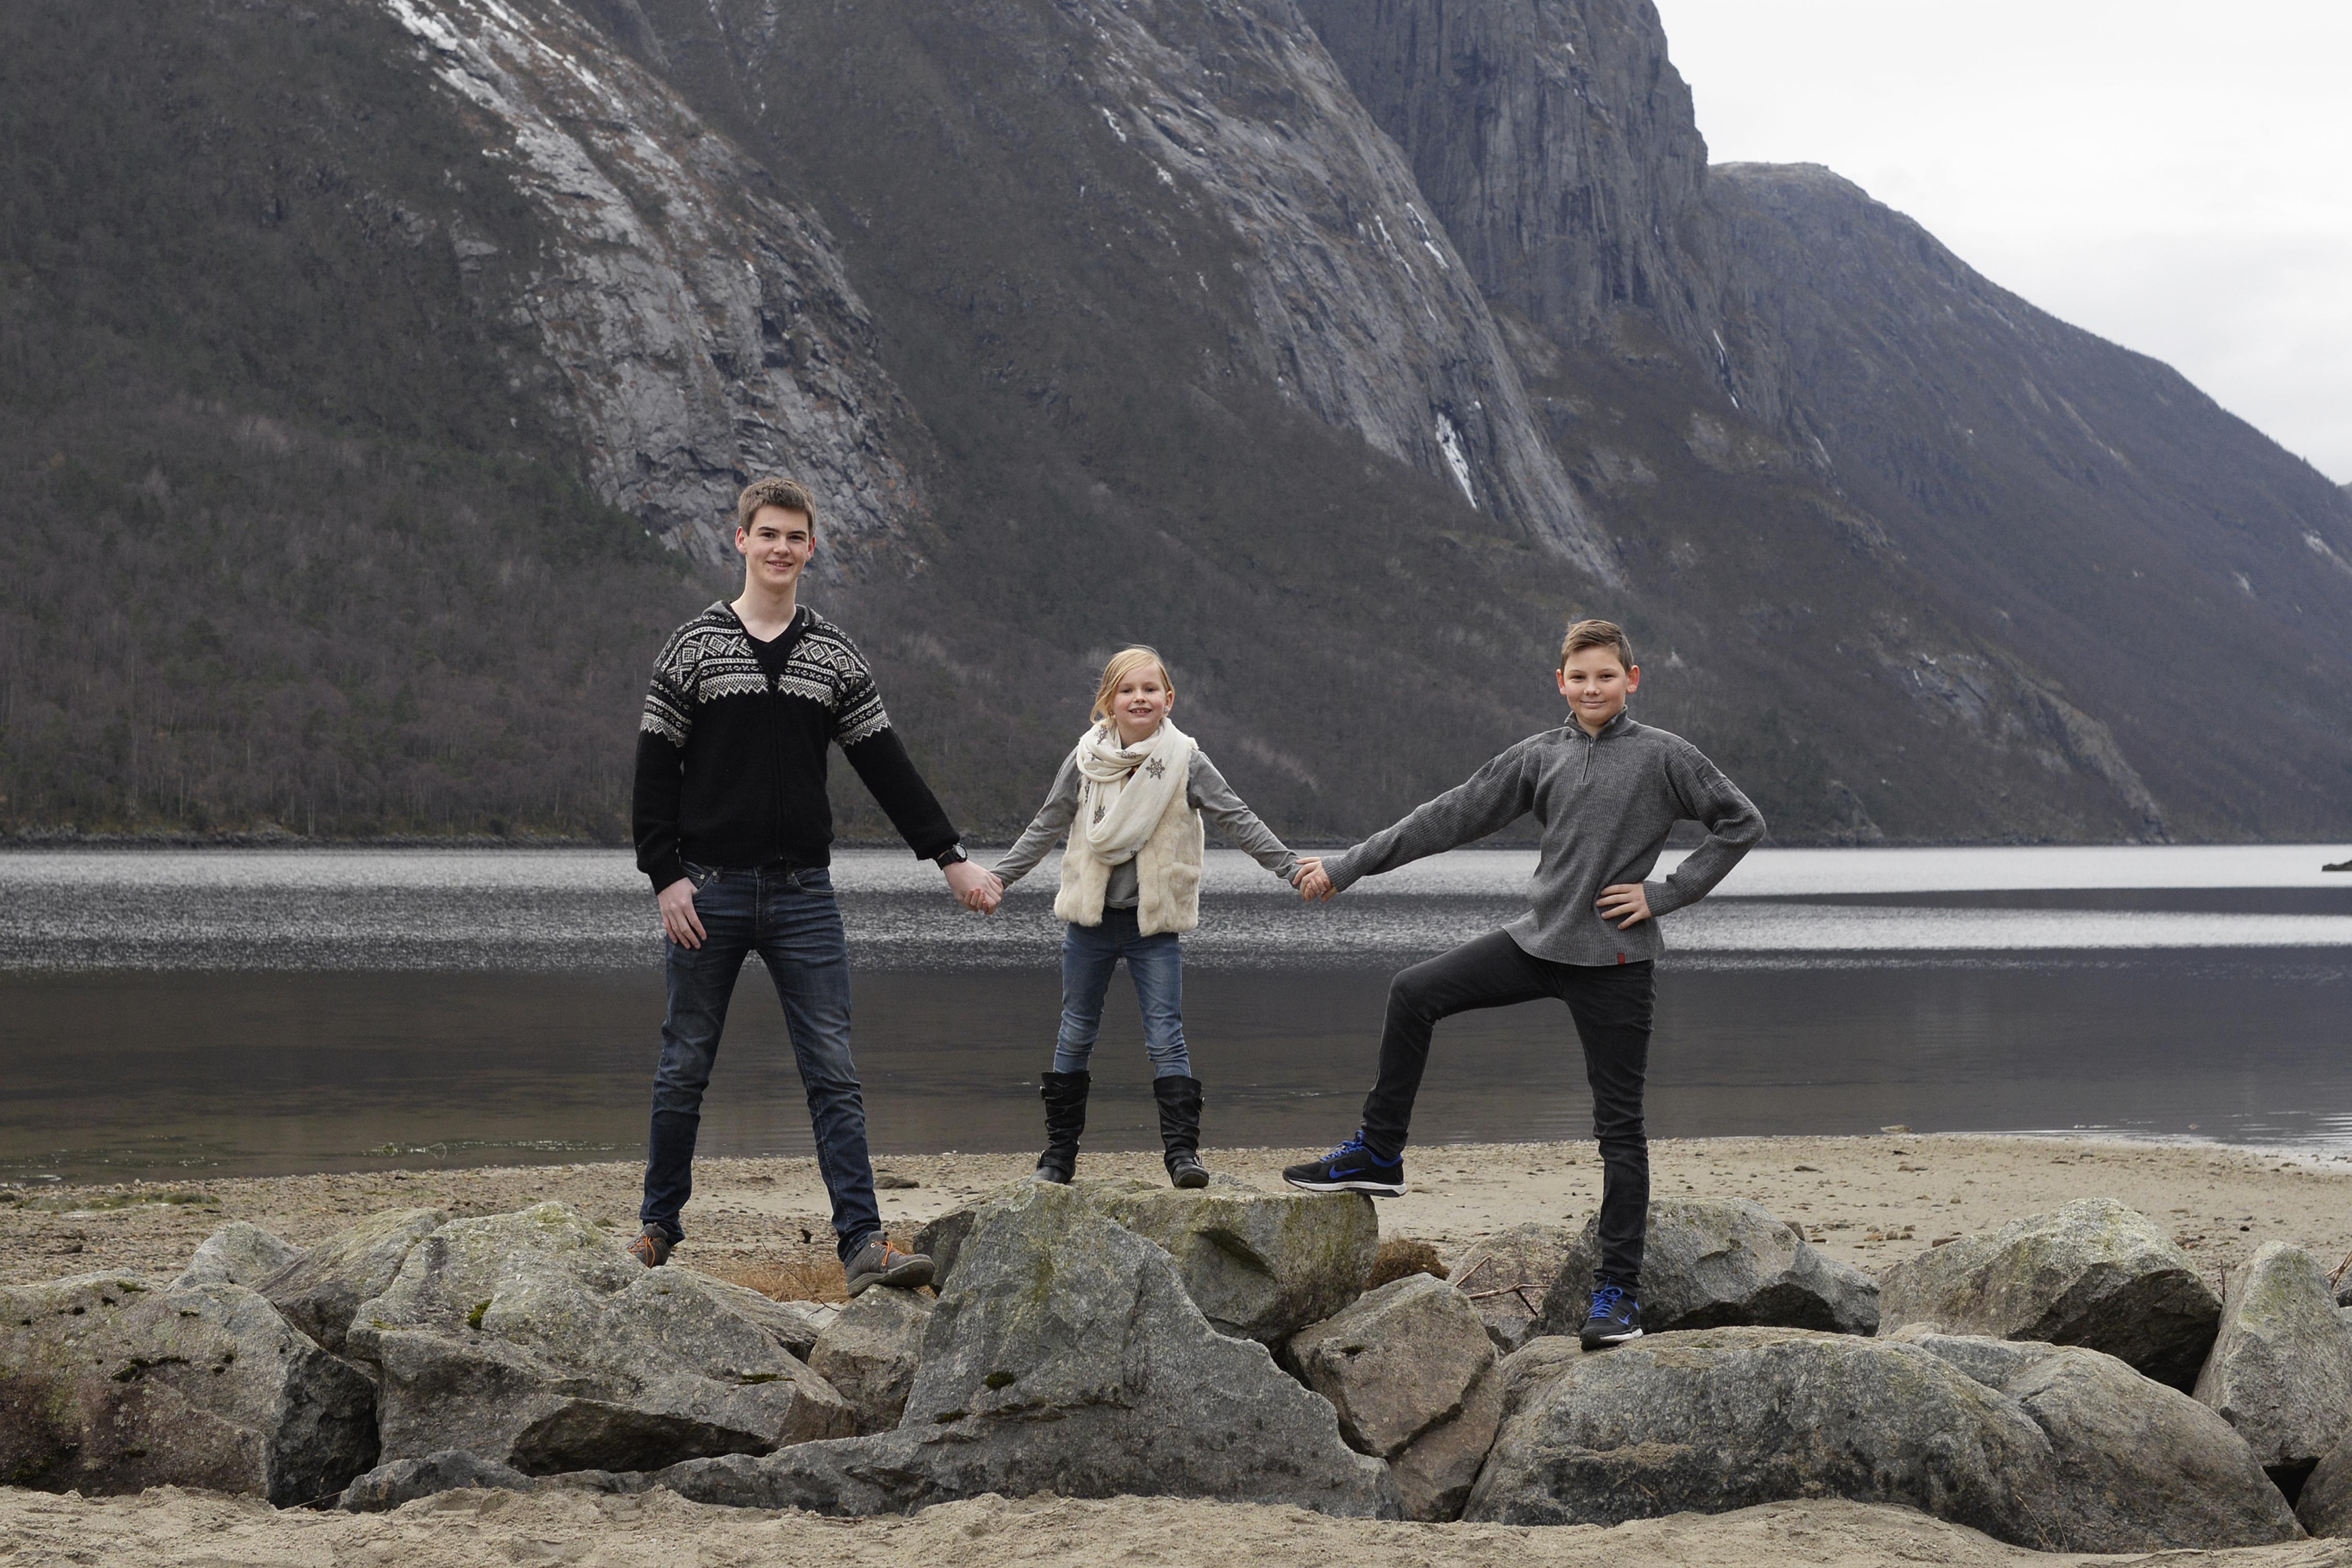 Nordbøsøsken